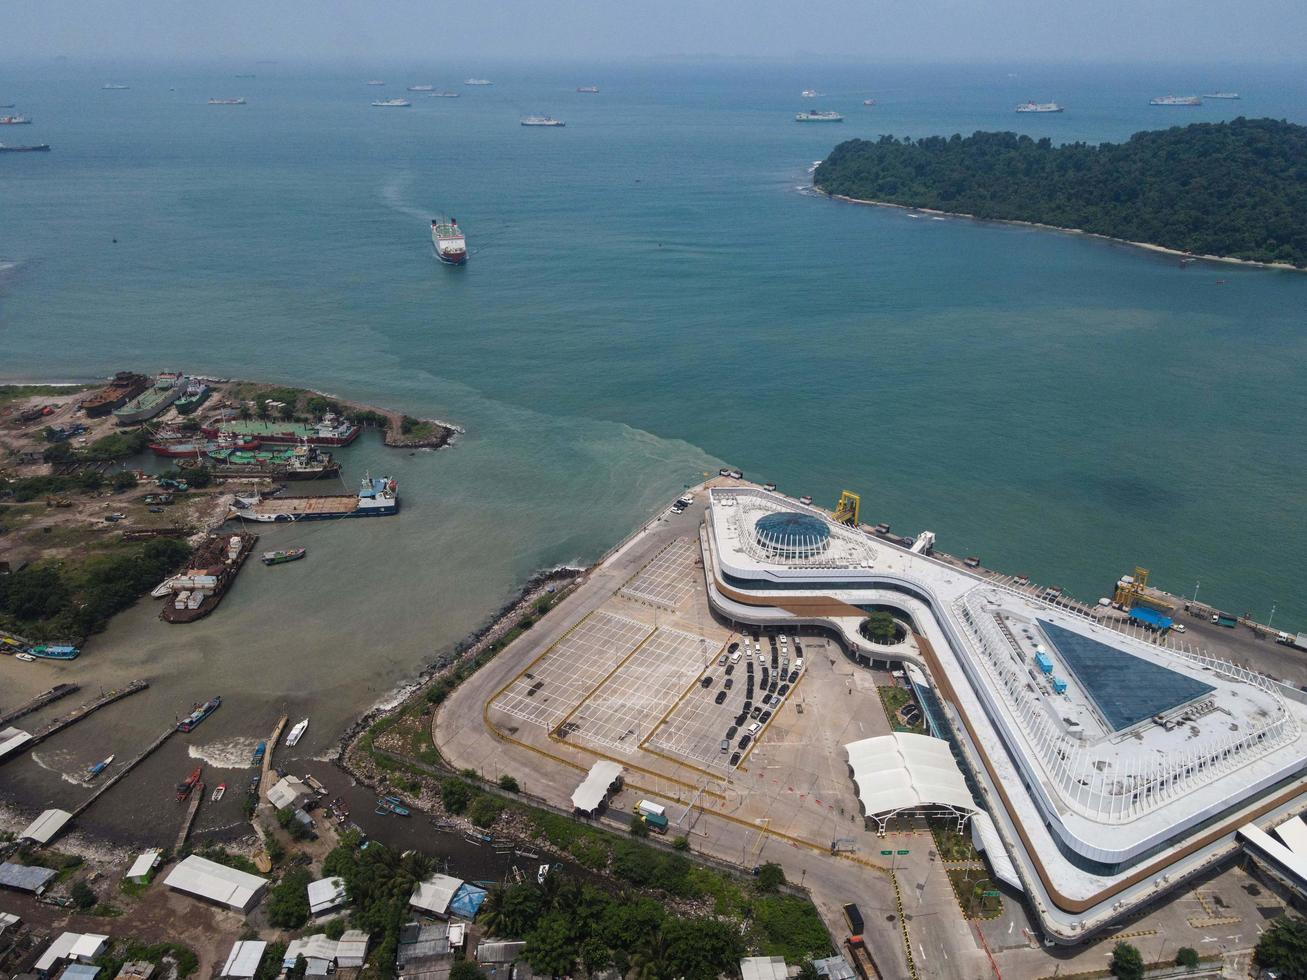 Banten, Indonesia 2021 - Vista aérea de Pelabuhan Merak Marine Port y Town Harbour Island en la luz del sol por la mañana foto